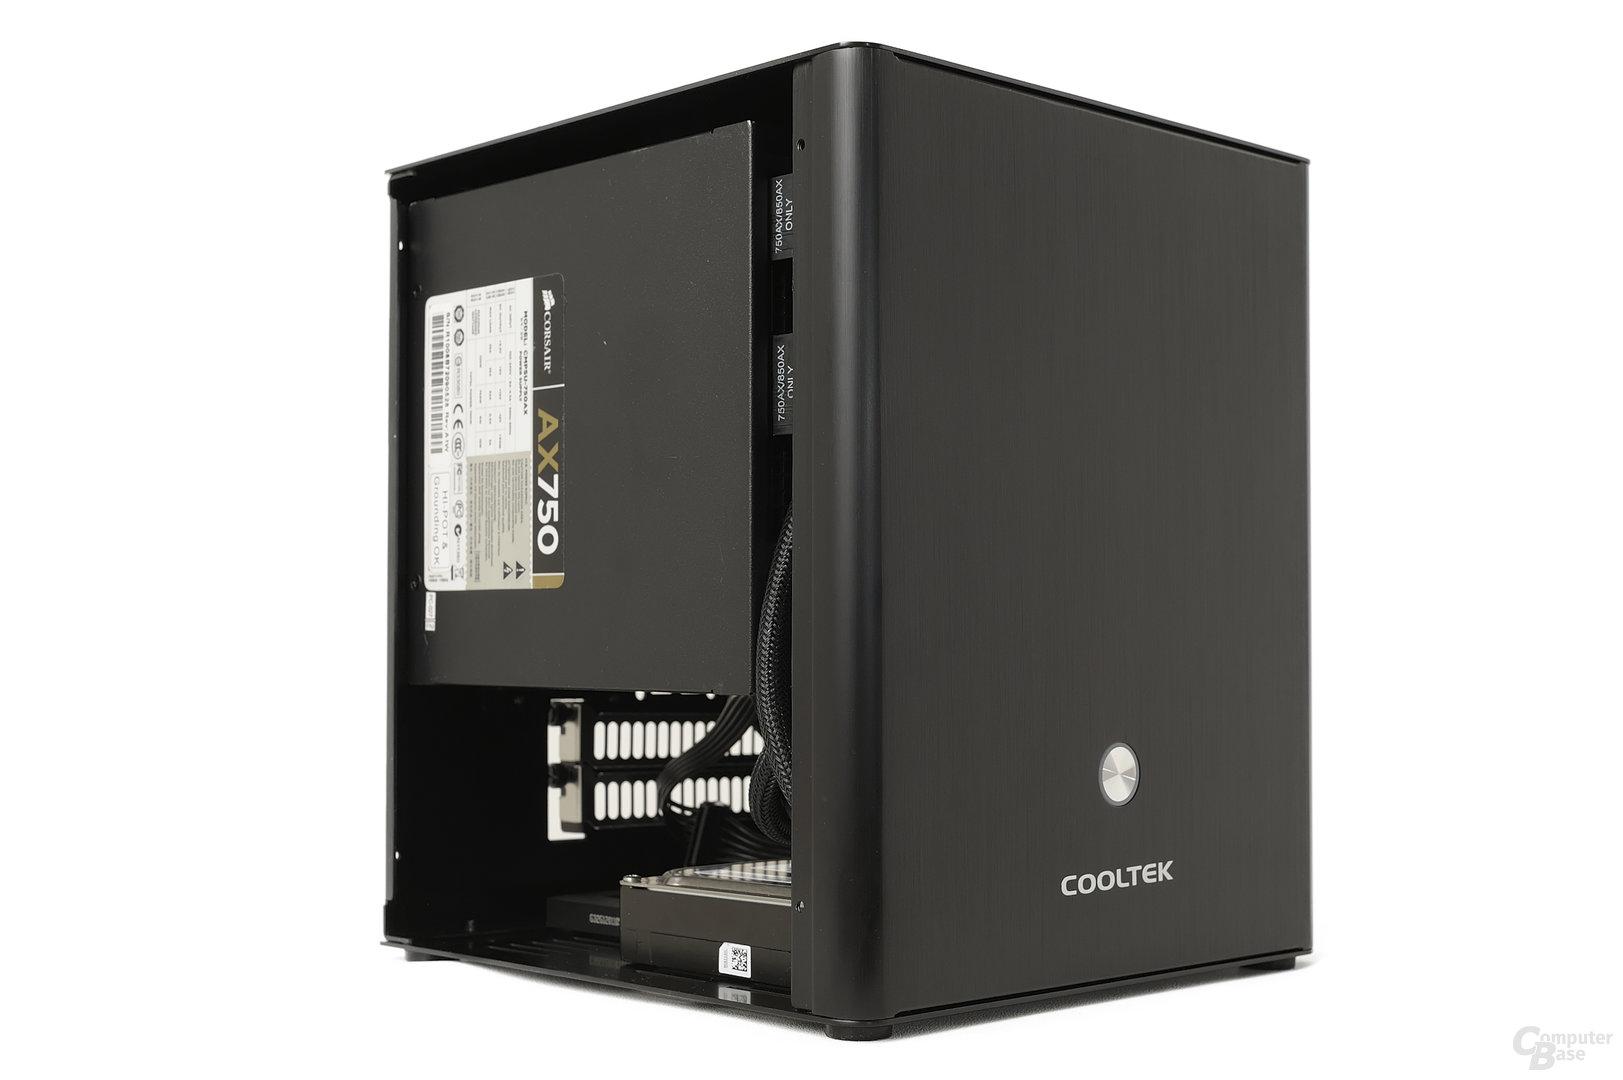 Cooltek Coolcube - Testsystem seitlich